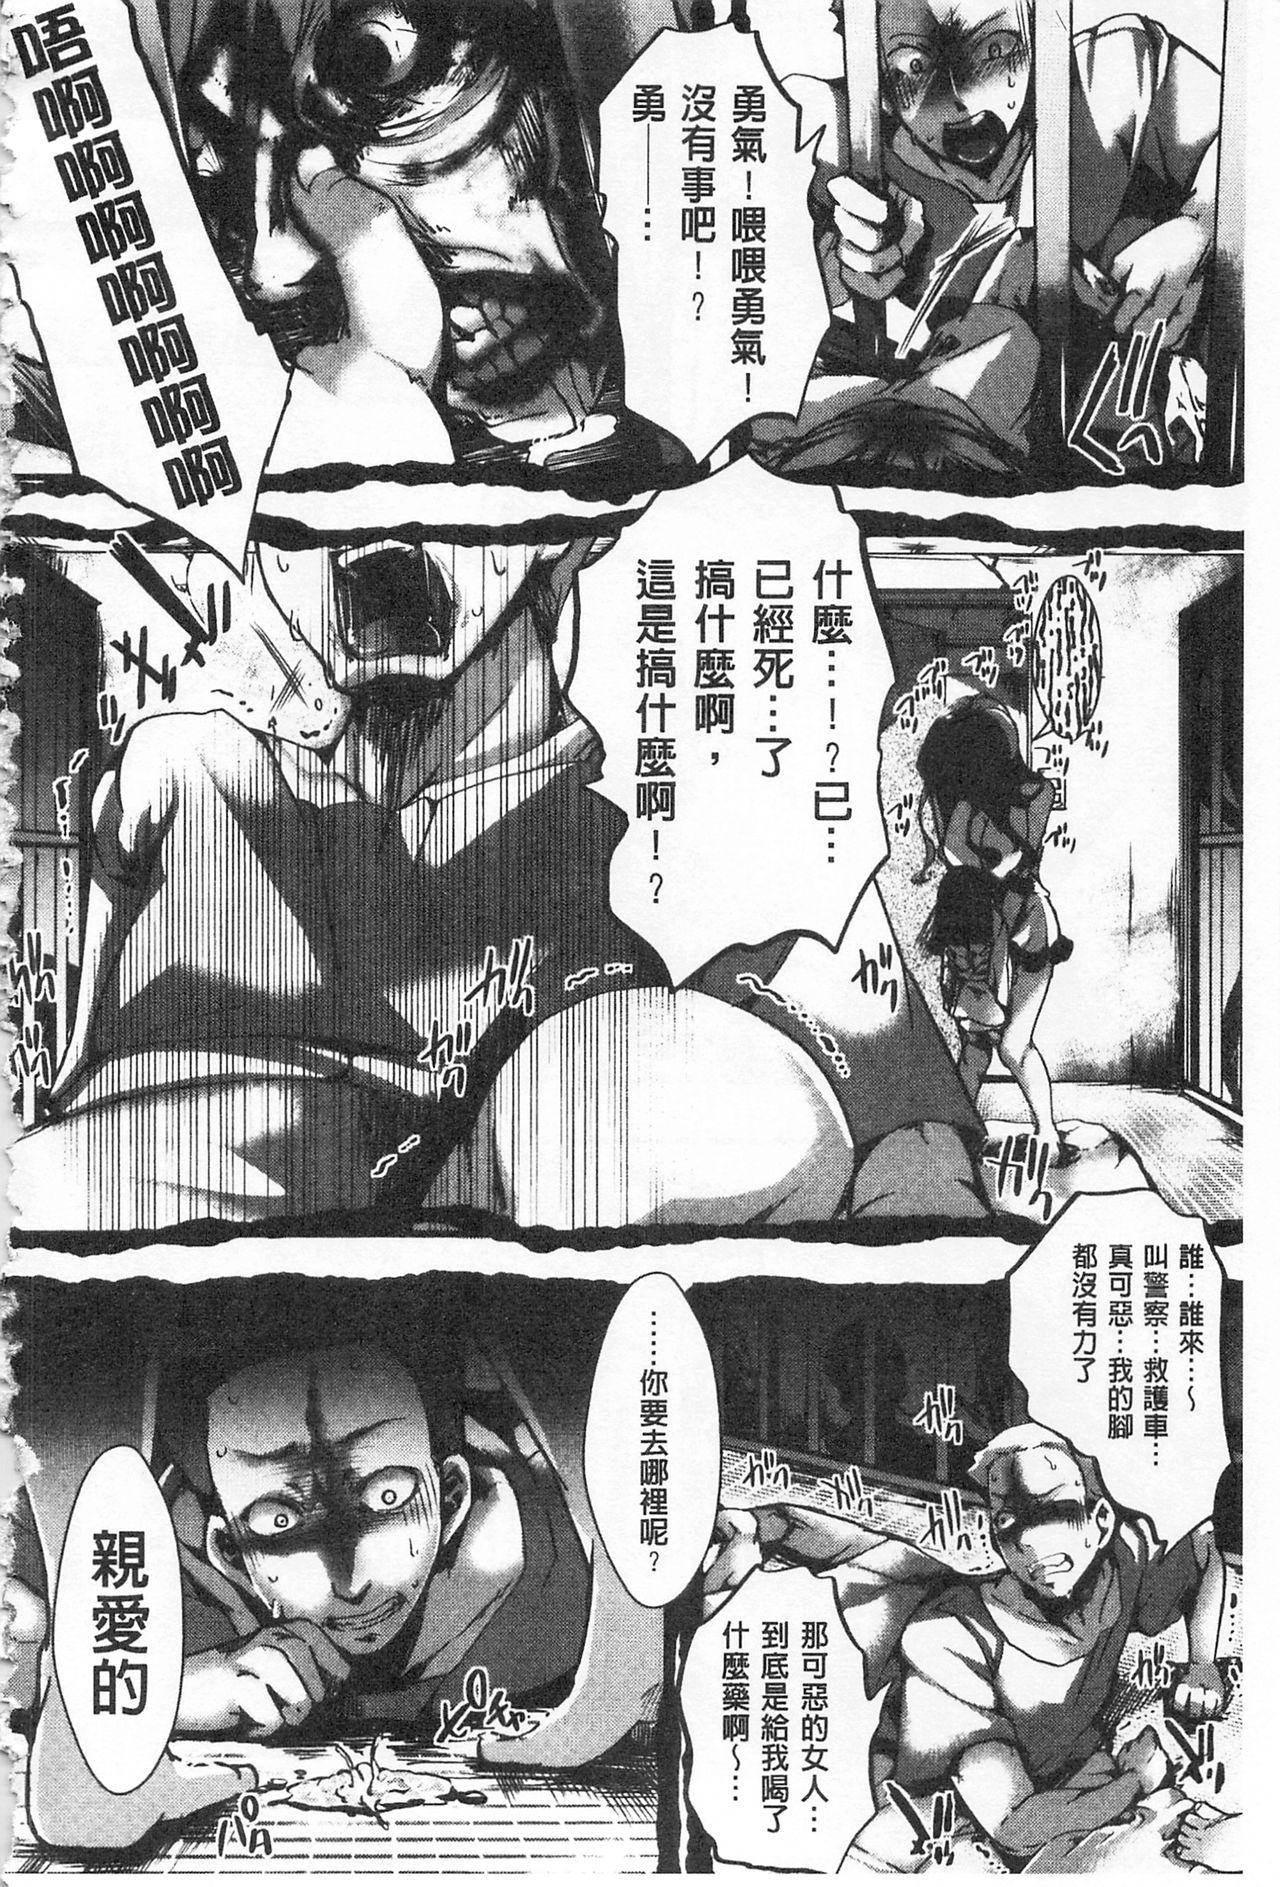 [hal] Daienjou -Ikare Ikasare Iki Ikare-   ∞艶嬢 -洩出來被搞到洩掛了被搞掛-  [Chinese] 61